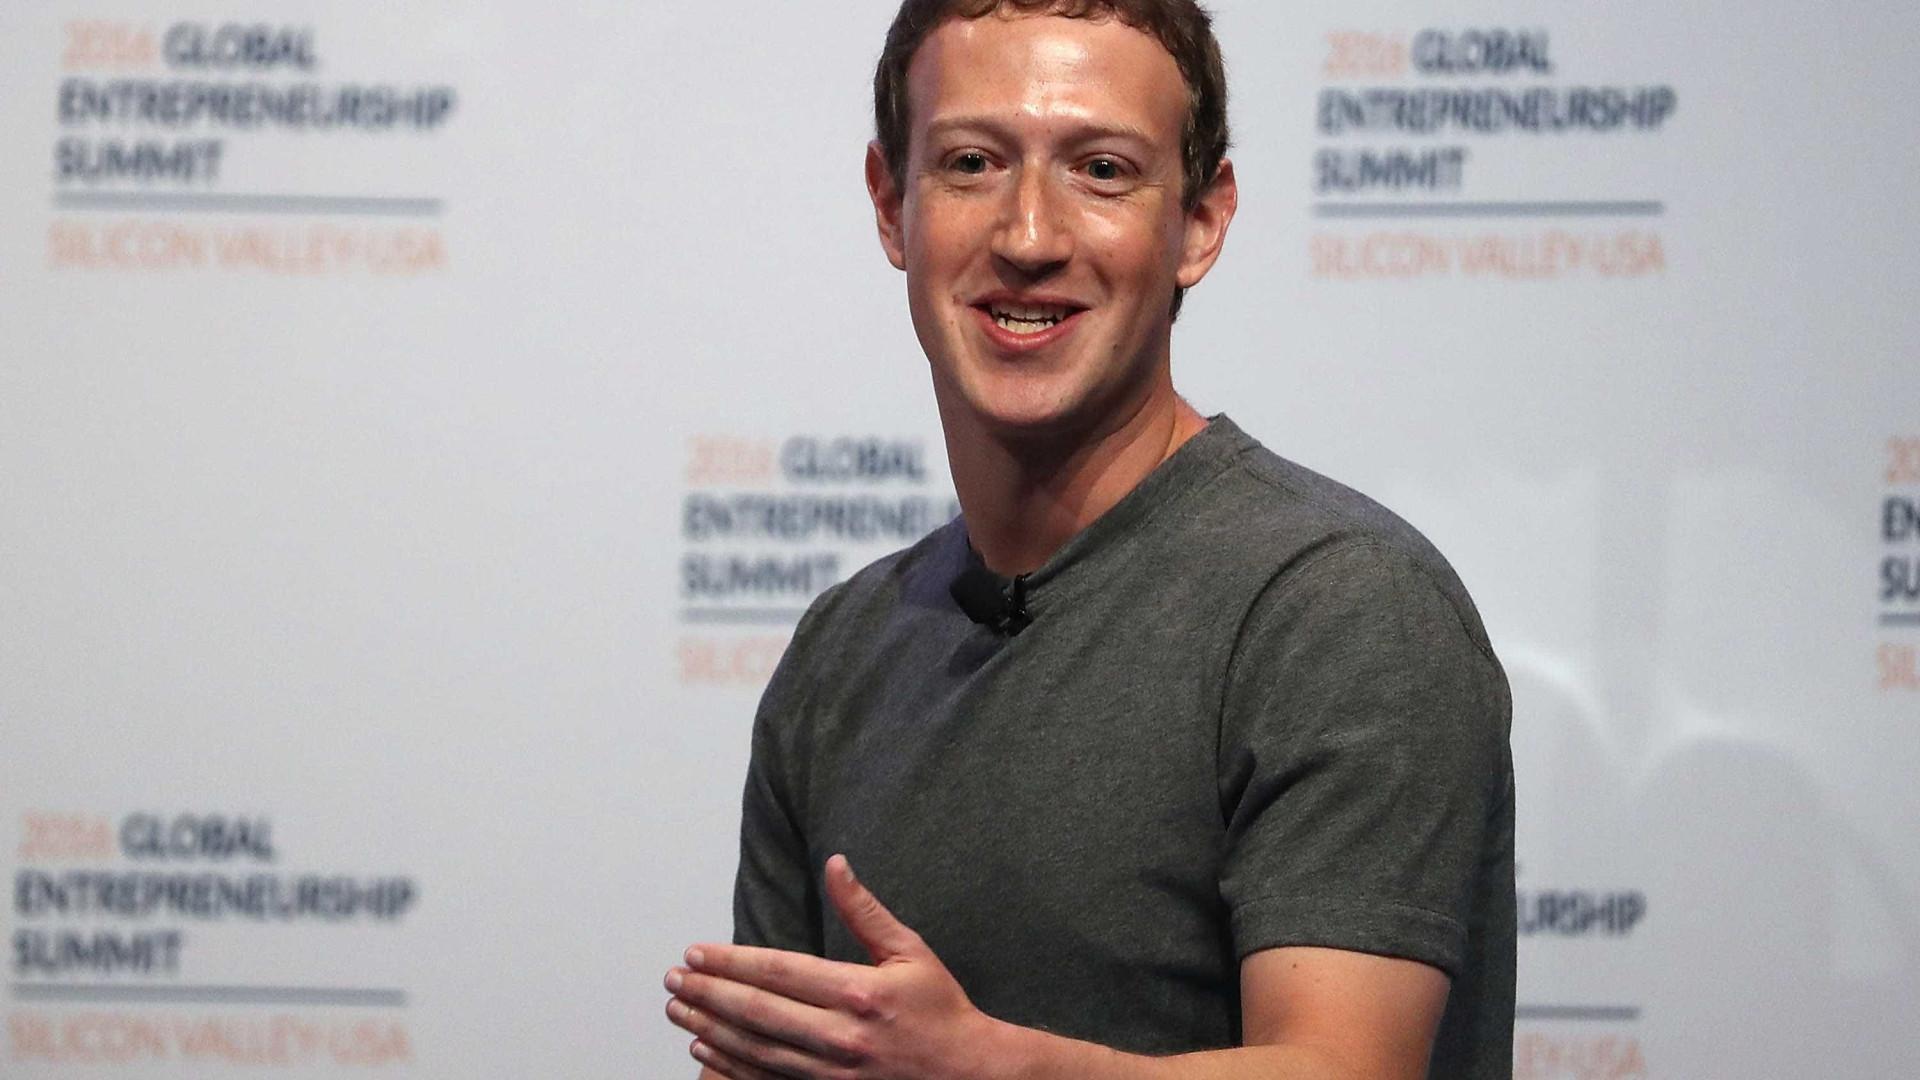 Resultado de imagem para Mark Zuckerberg anuncia julgamento